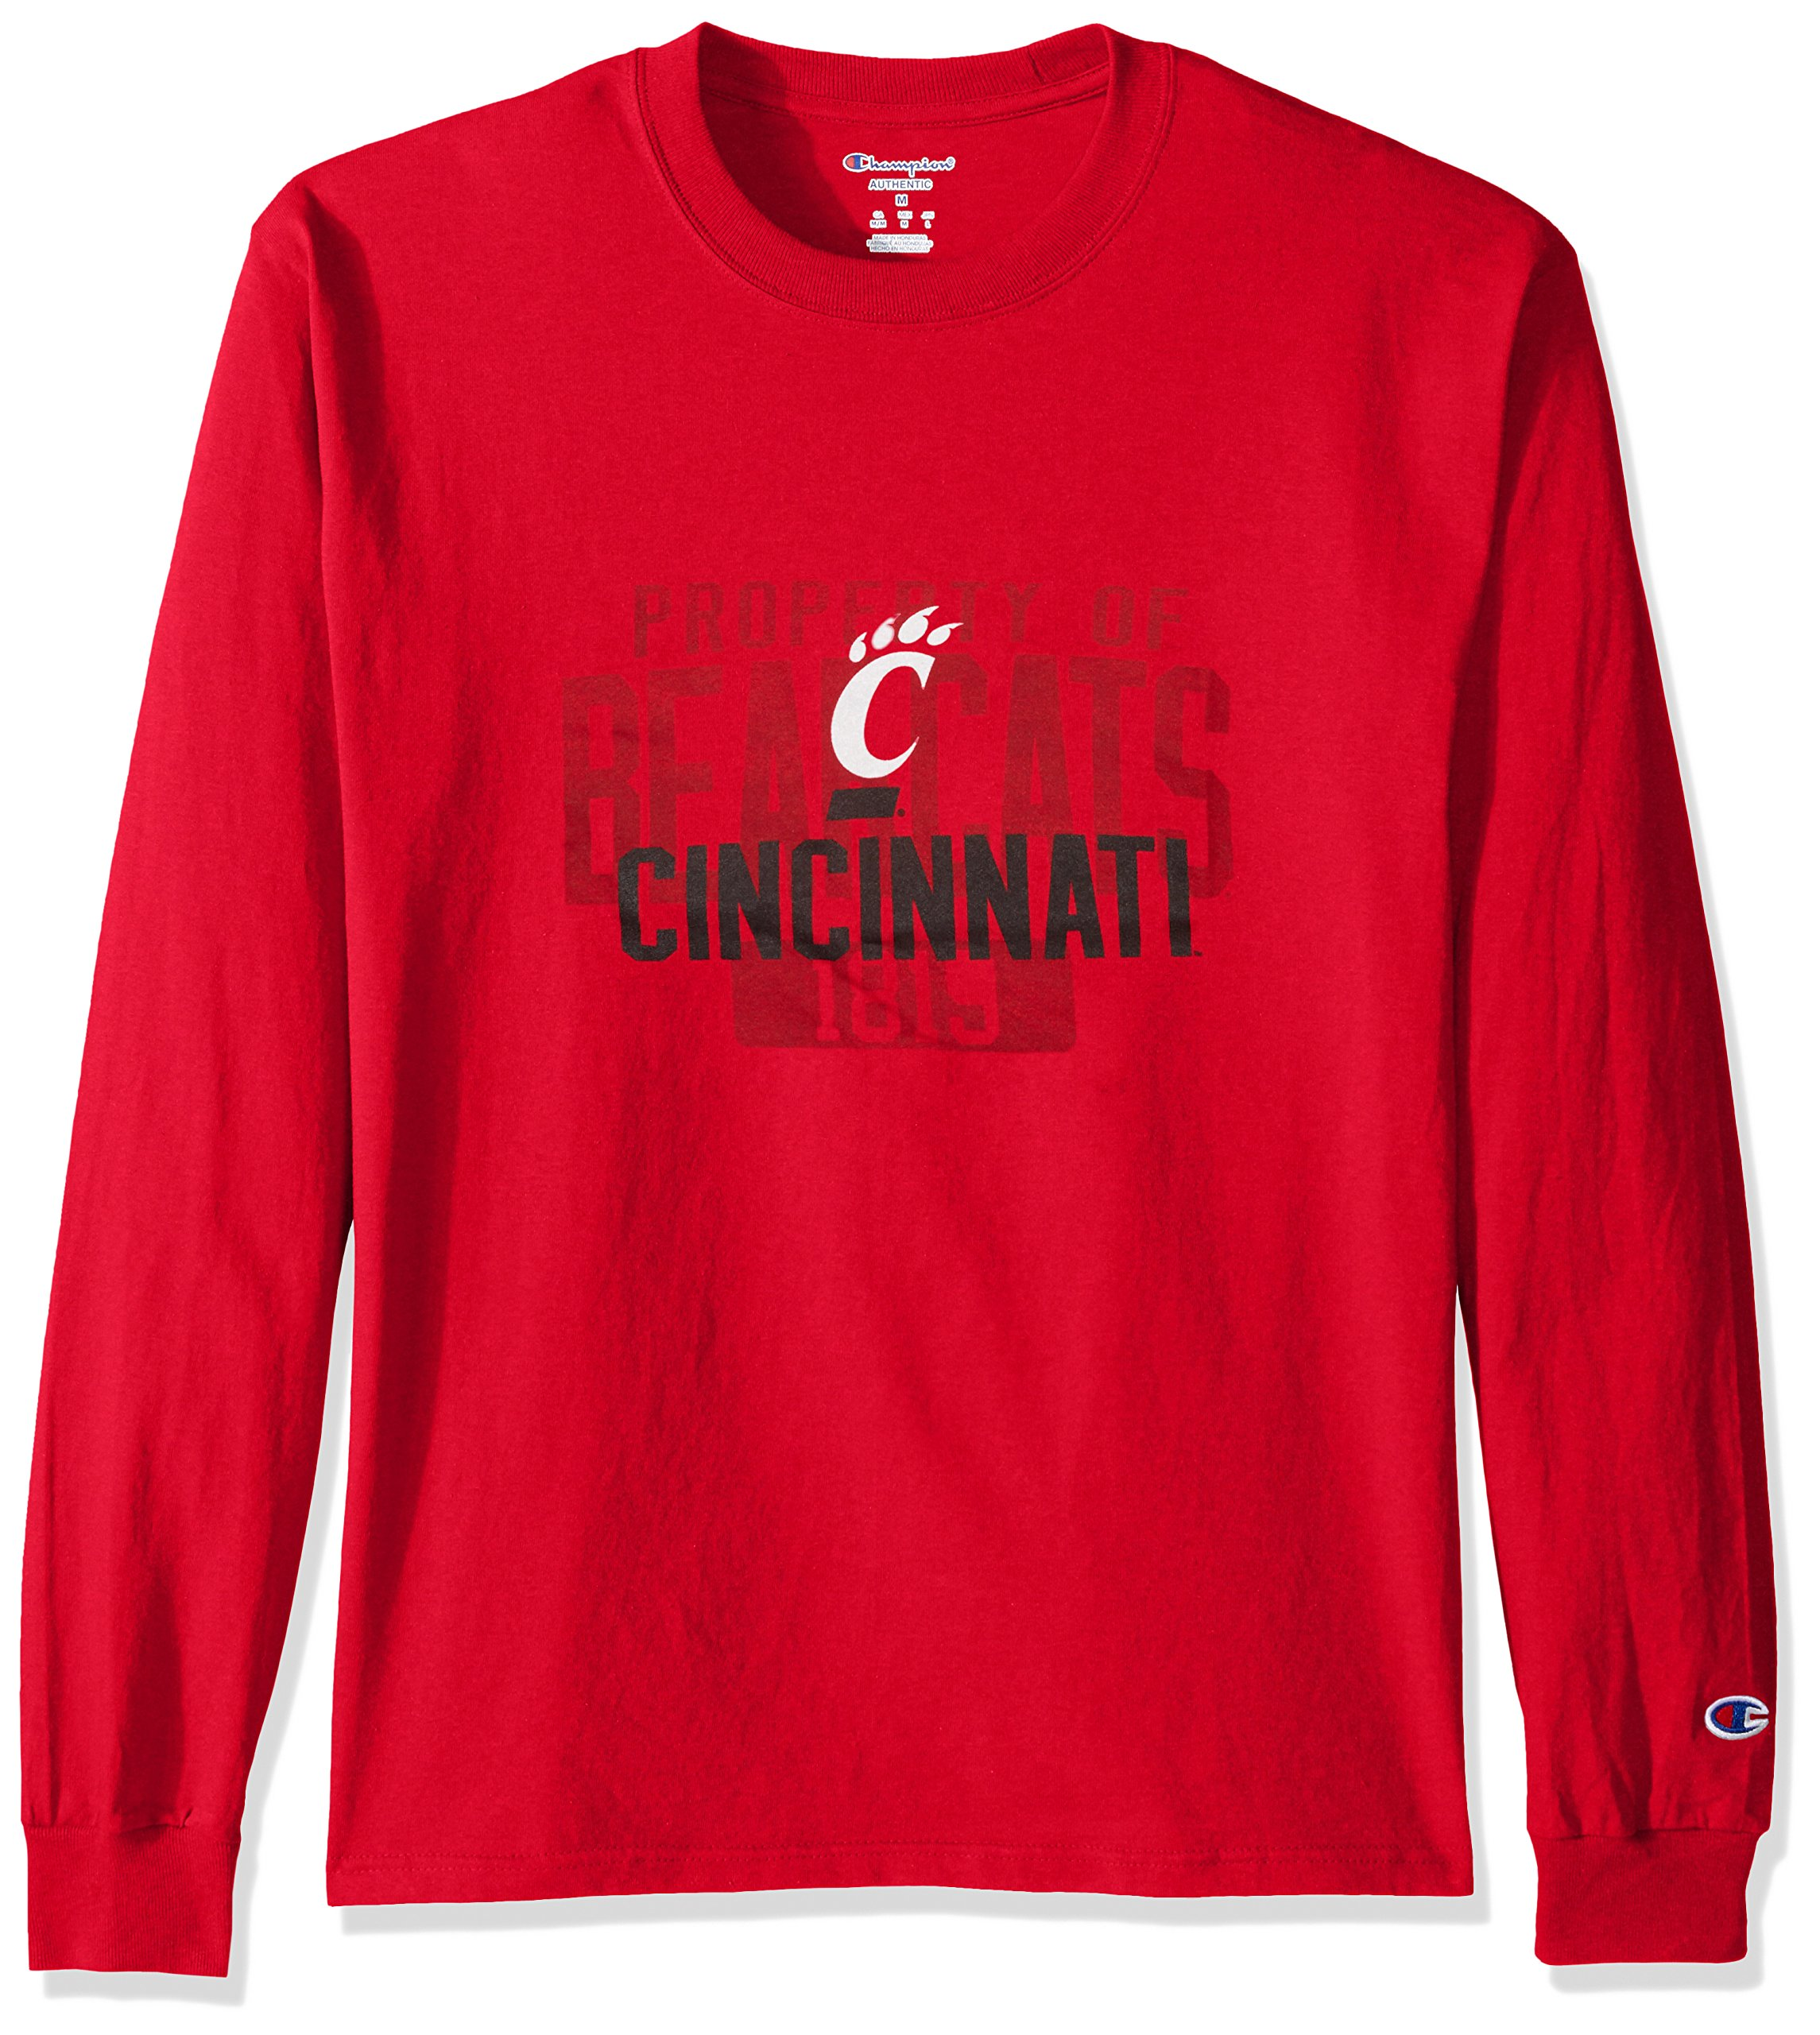 Champion NCAA Men's Long Sleeve Lightweight T-shirt Officially Licensed 100% Cotton Tagless Tee Cincinnati Bearcats Medium